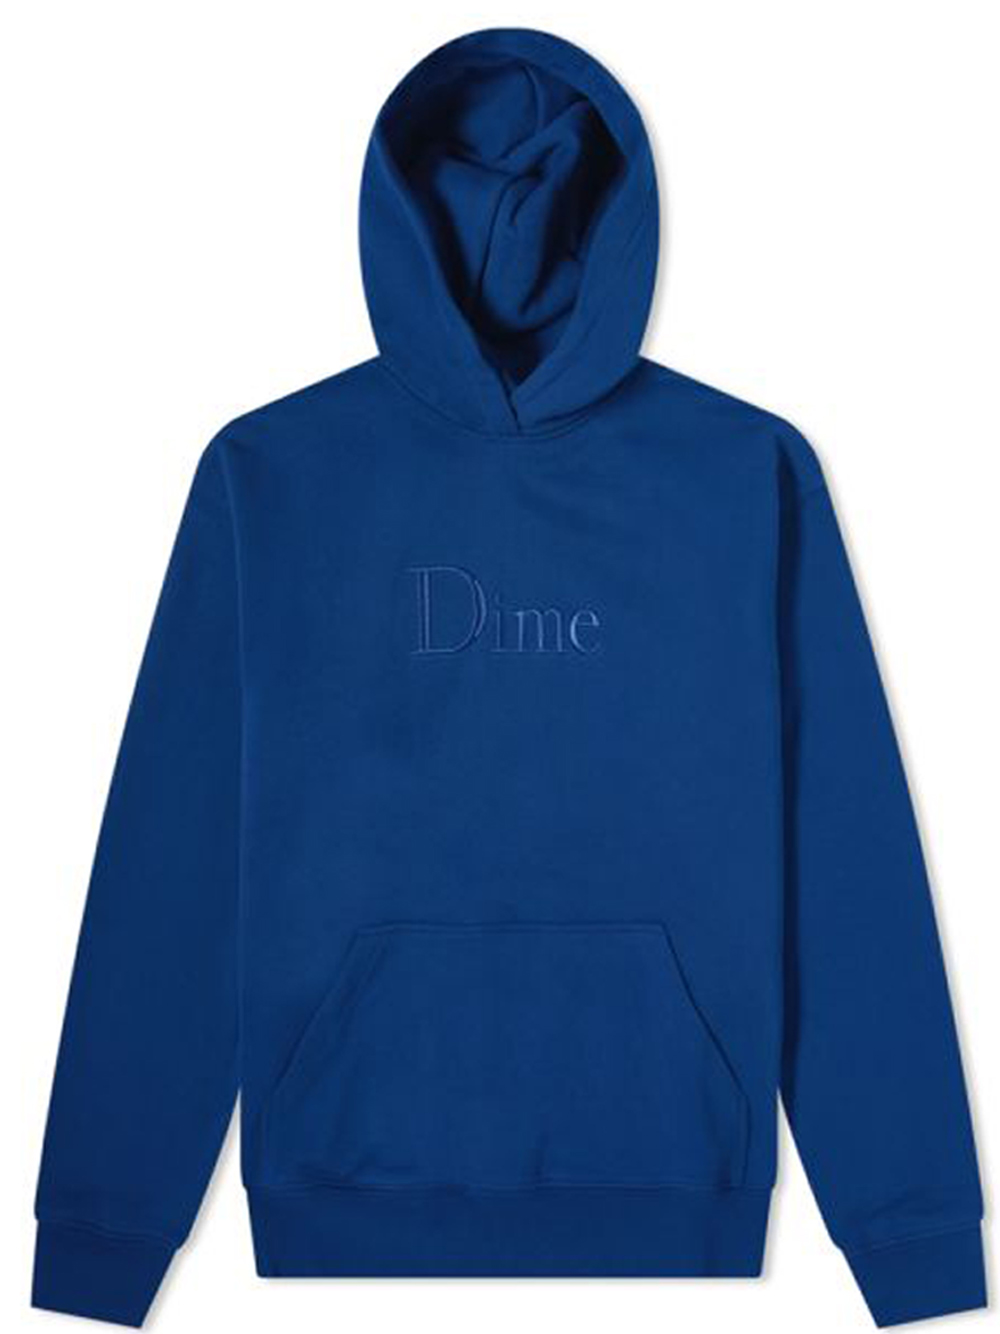 Logo sweatshirt navy man Cotton DIME | Sweatshirts | DIME5007NVY